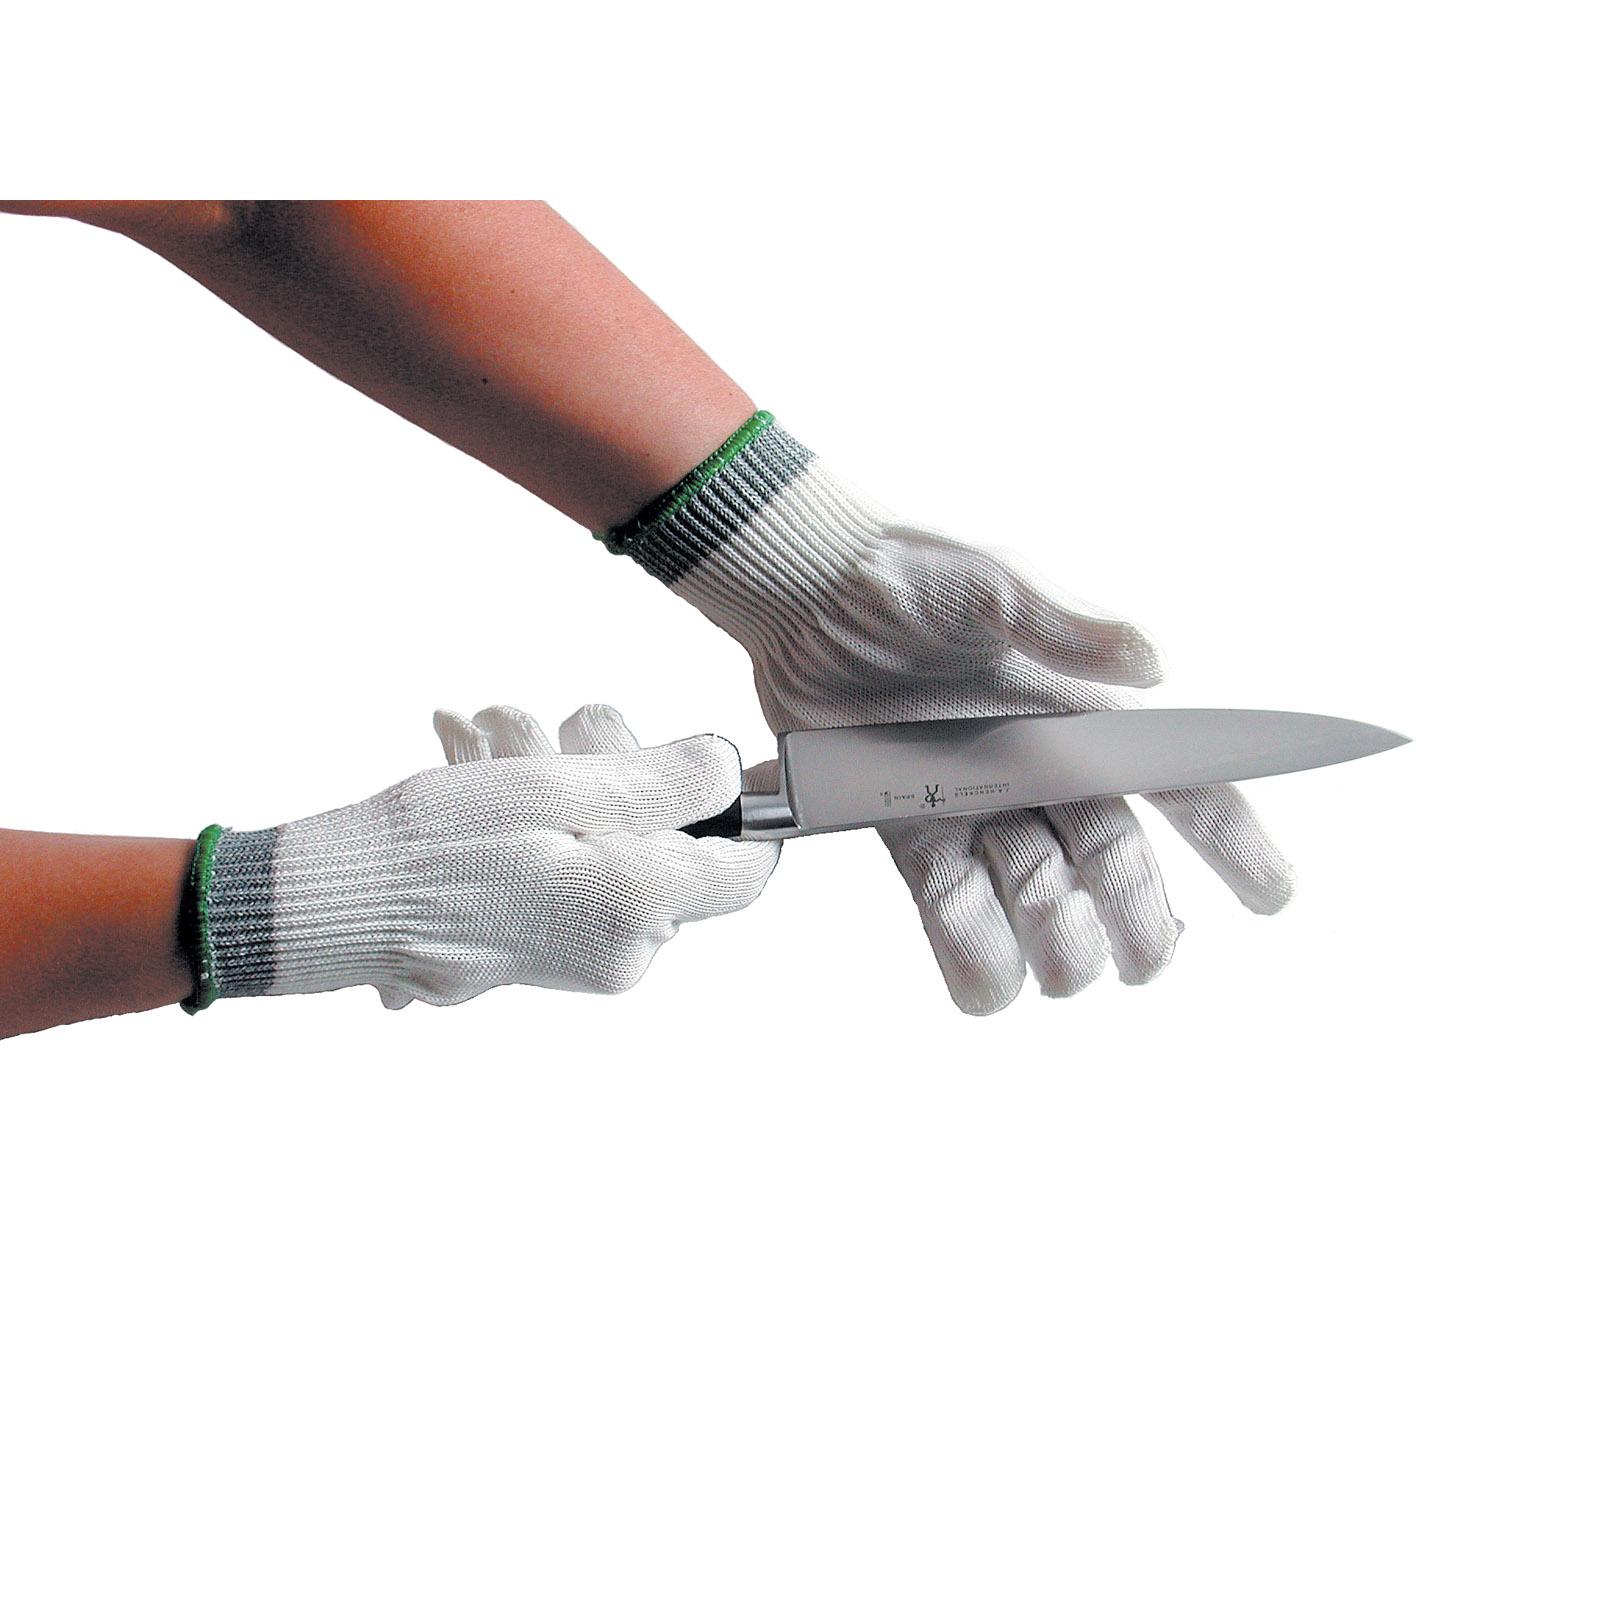 San Jamar SG10-L glove, cut resistant